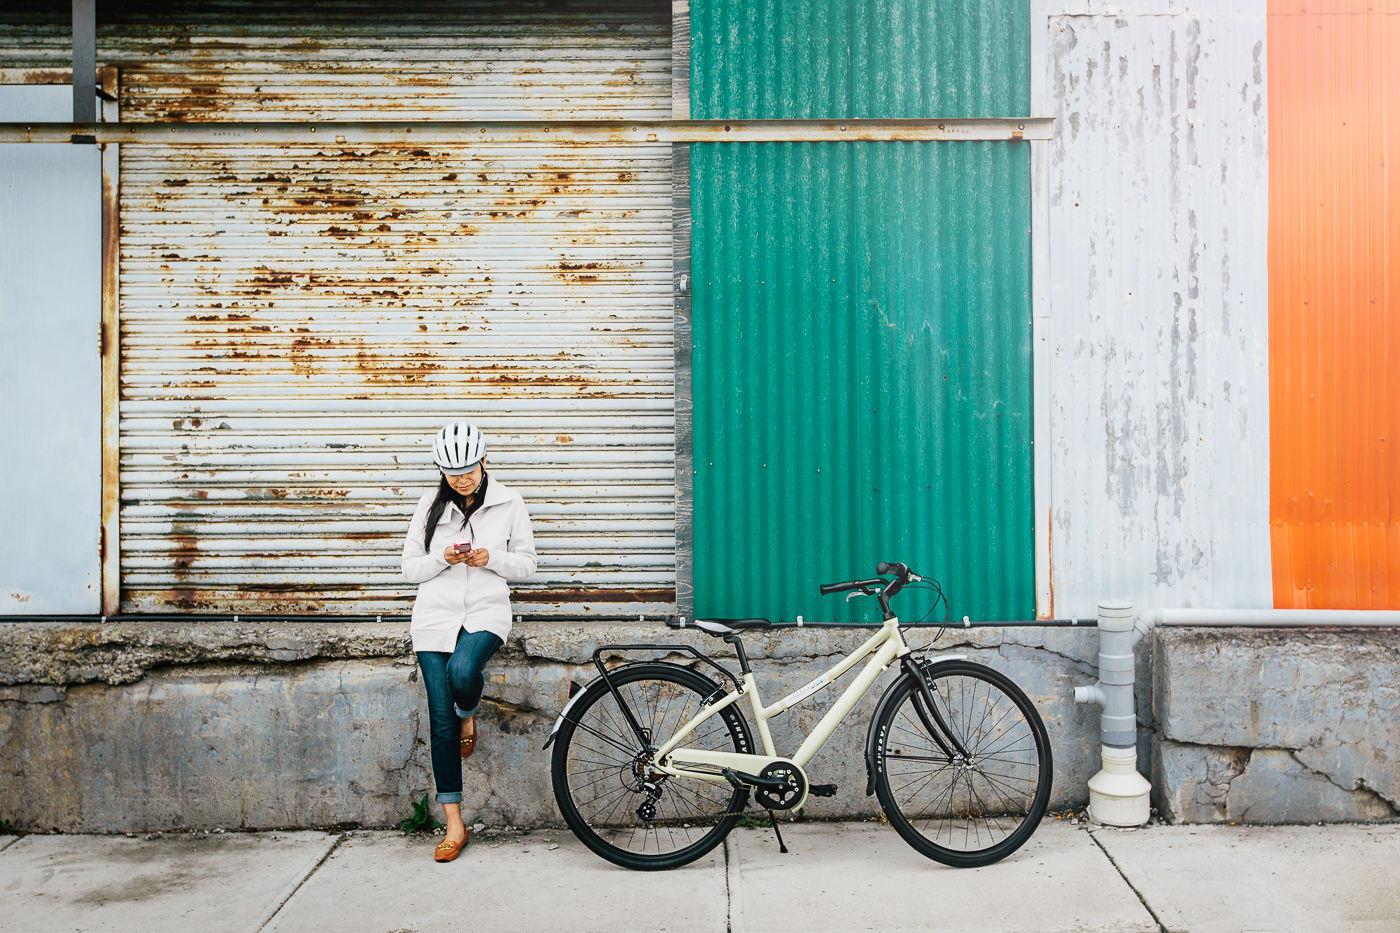 Vélos Opus Bike urbain dans une rue